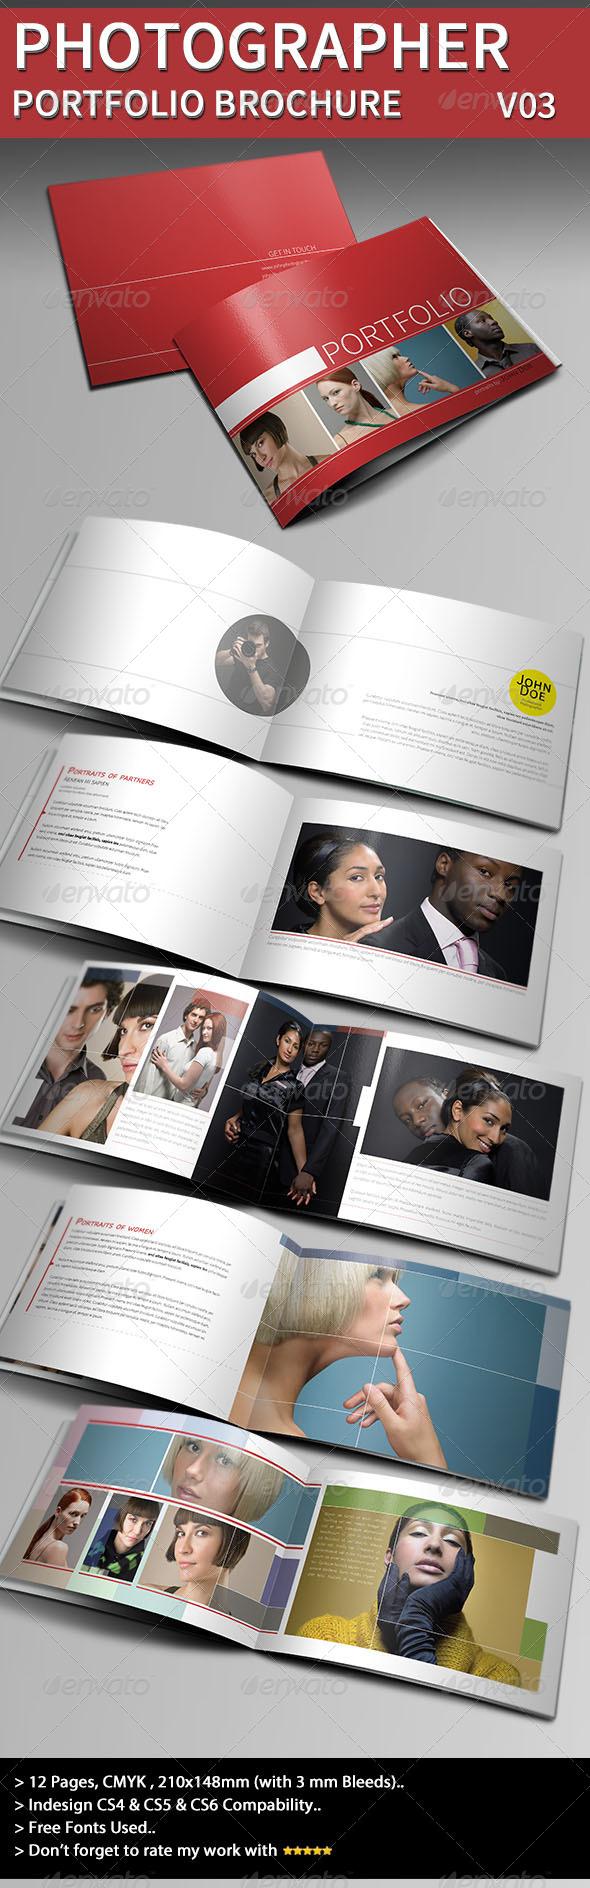 Photographer Portfolio Brochure Template III - Portfolio Brochures